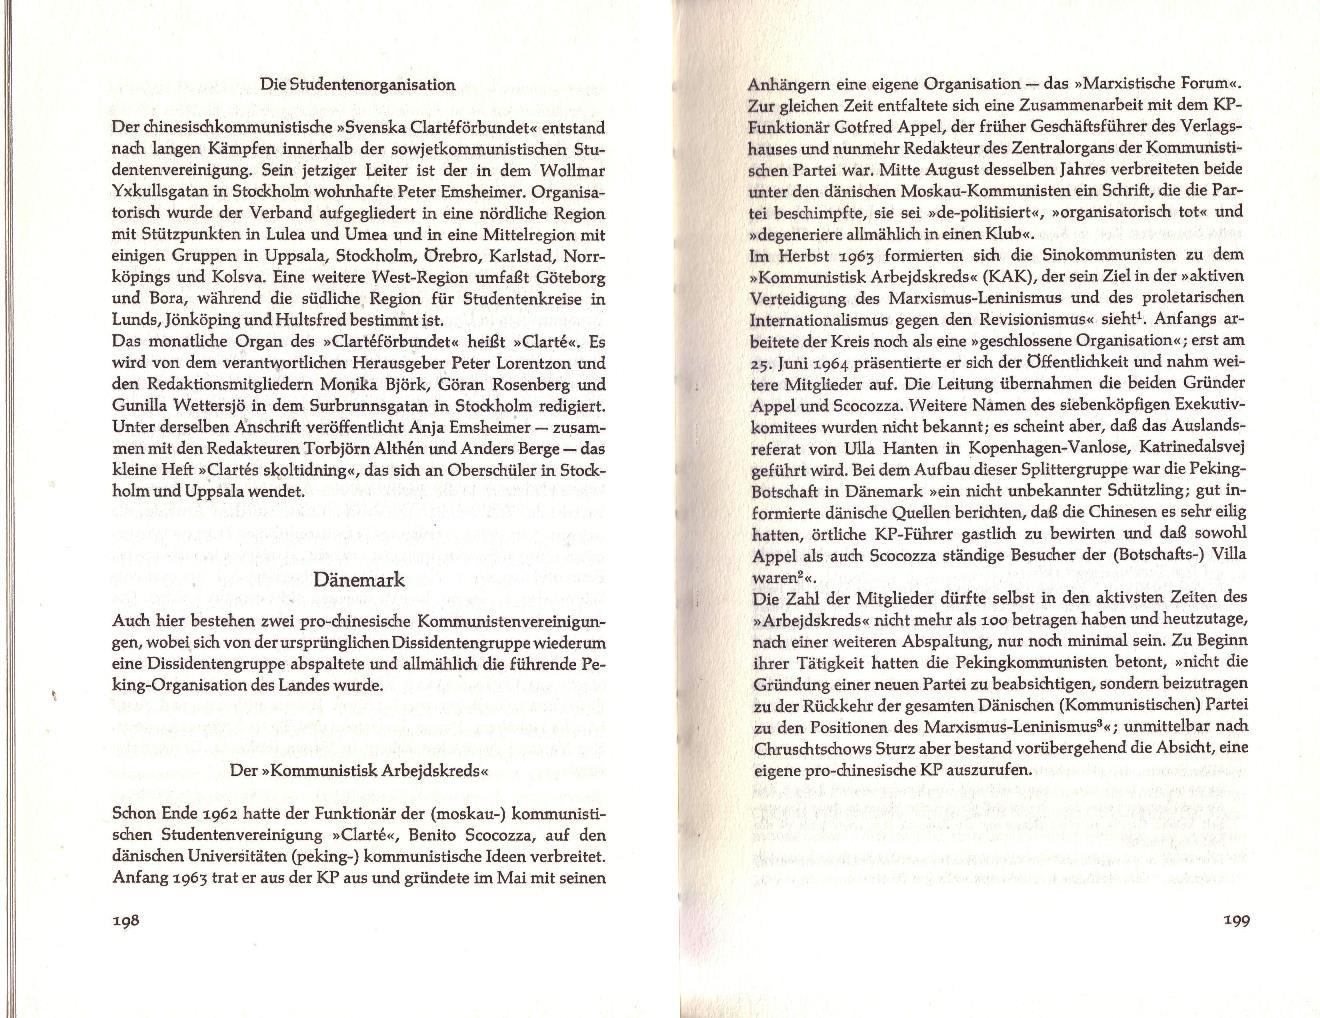 Schlomann_Friedlingstein_Die_Maoisten_0103